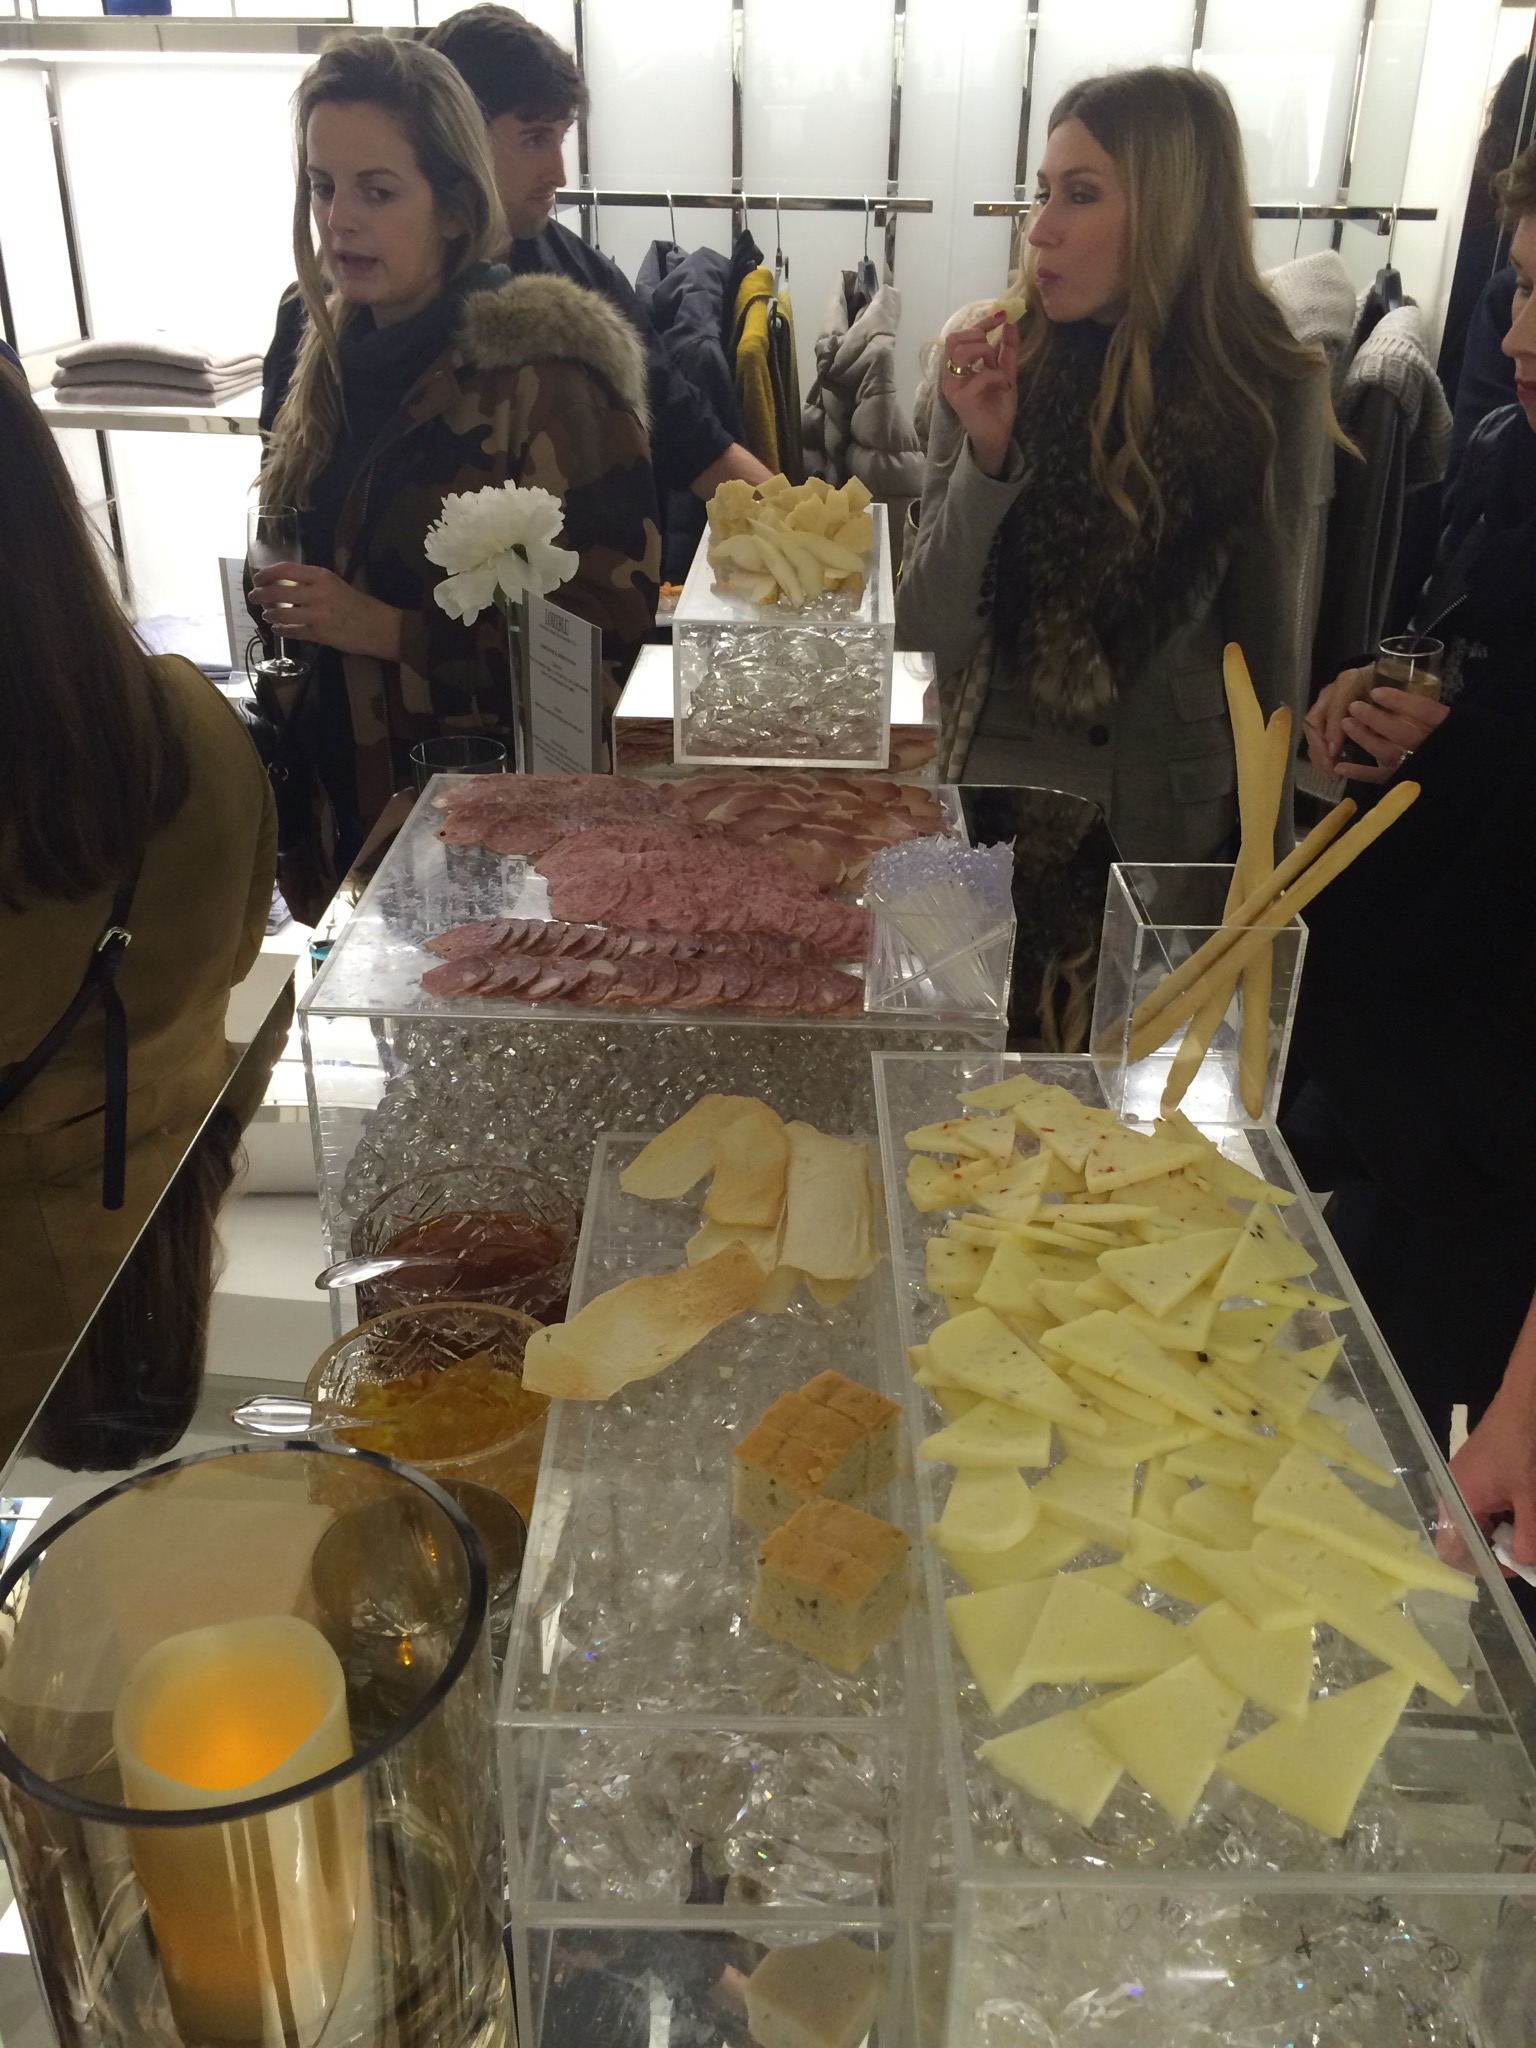 Italian-style food